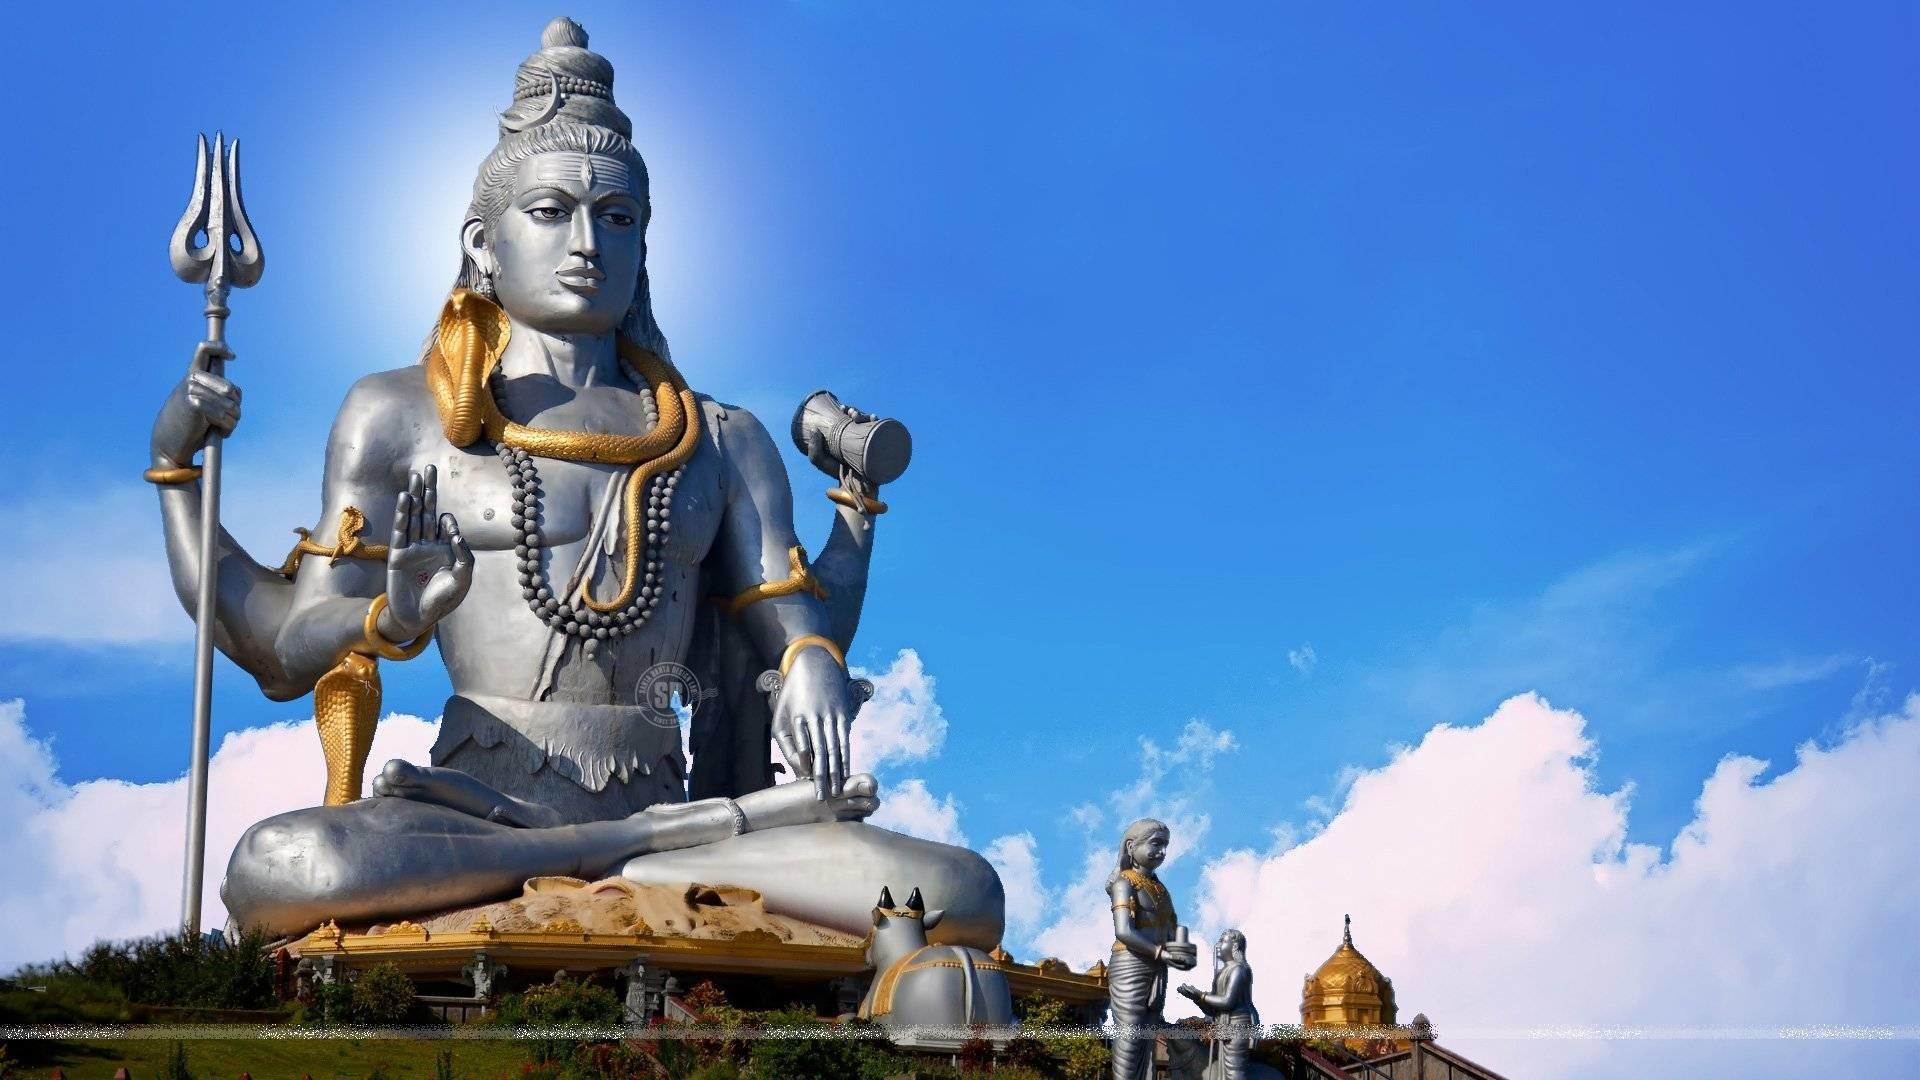 Shiva Wallpaper For Desktop: Hindu God HD Wallpapers 1080p (68+ Images